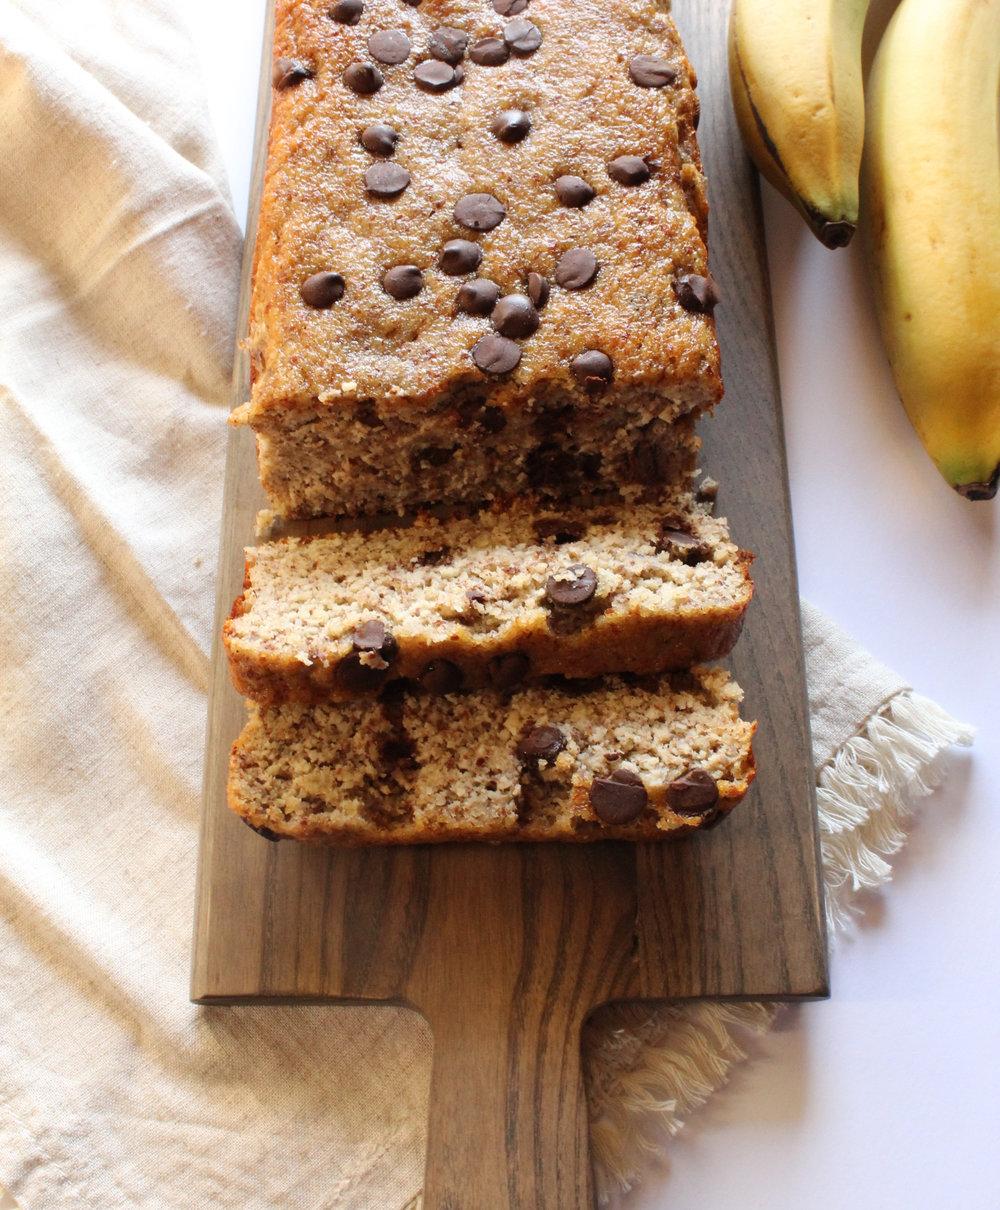 Chocolate Chip Banana Bread - Gluten & Dairy-Free